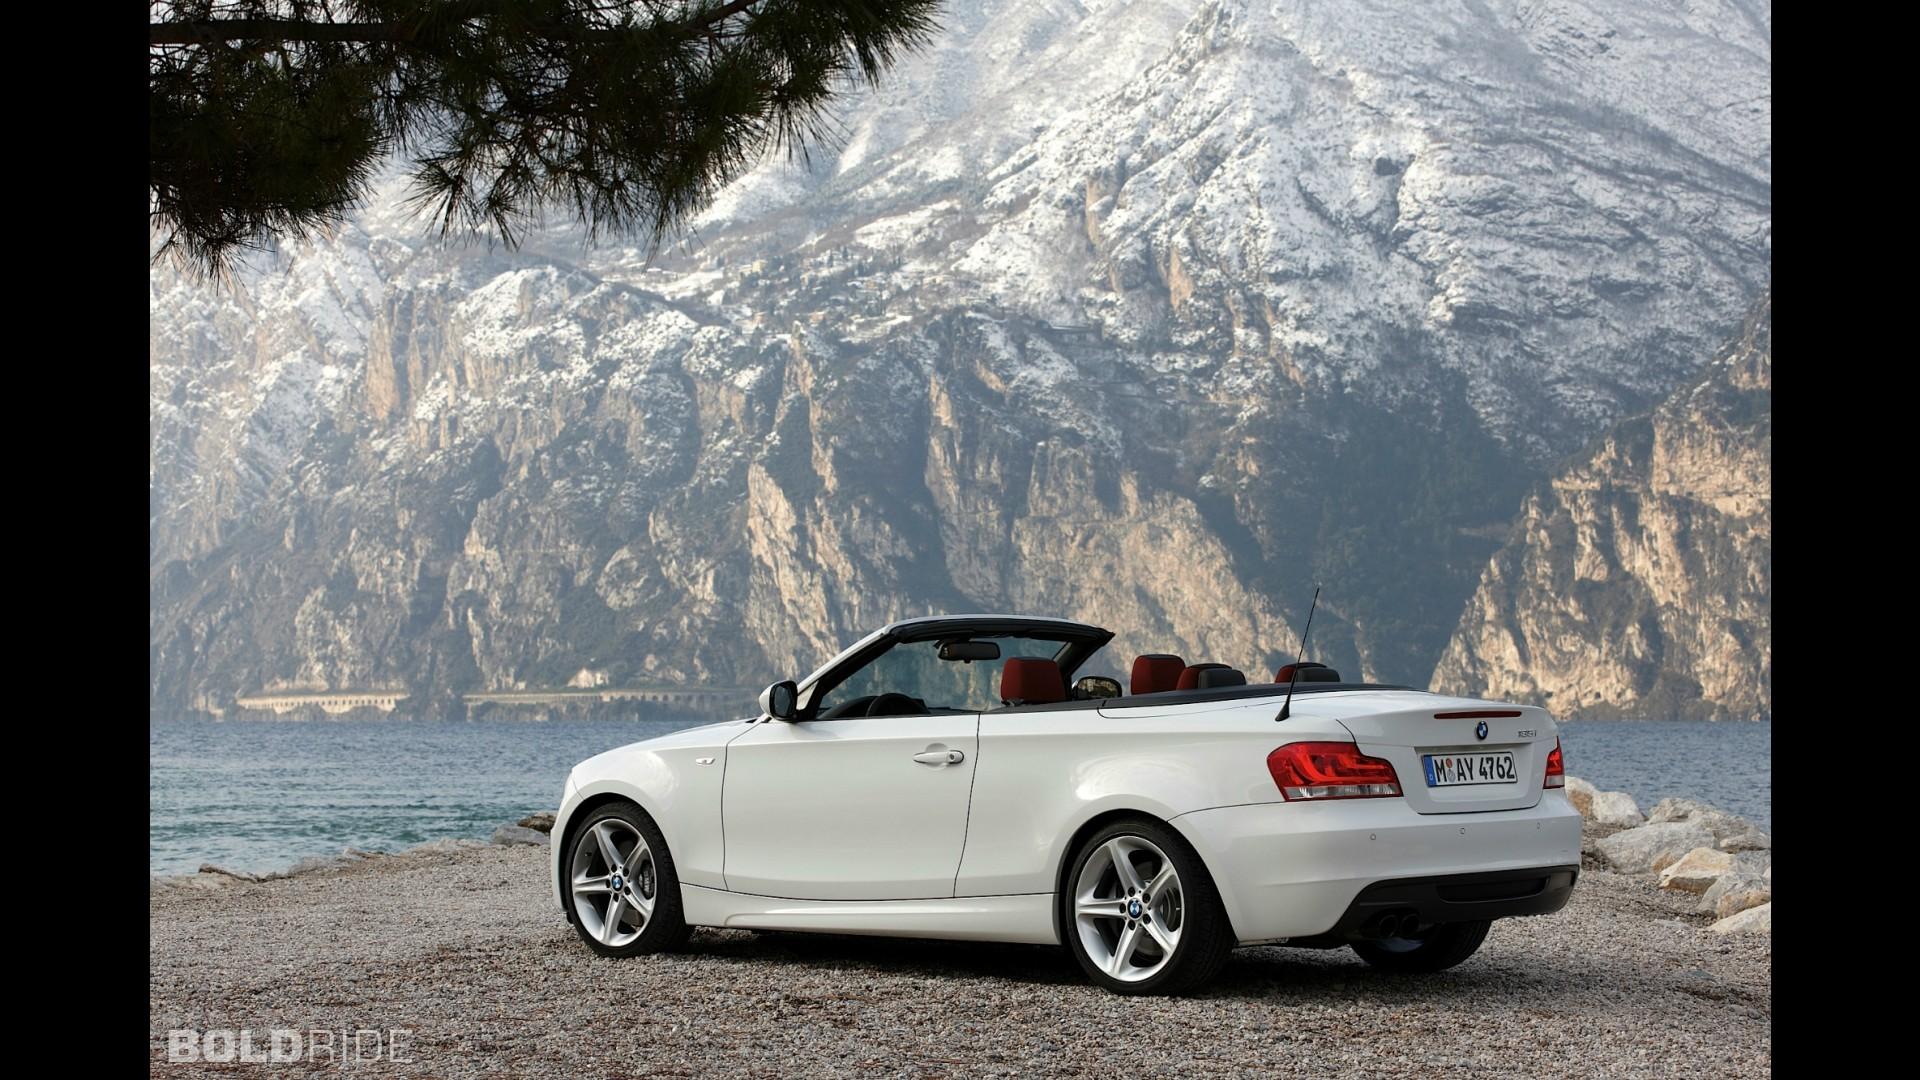 BMW 135i Convertible